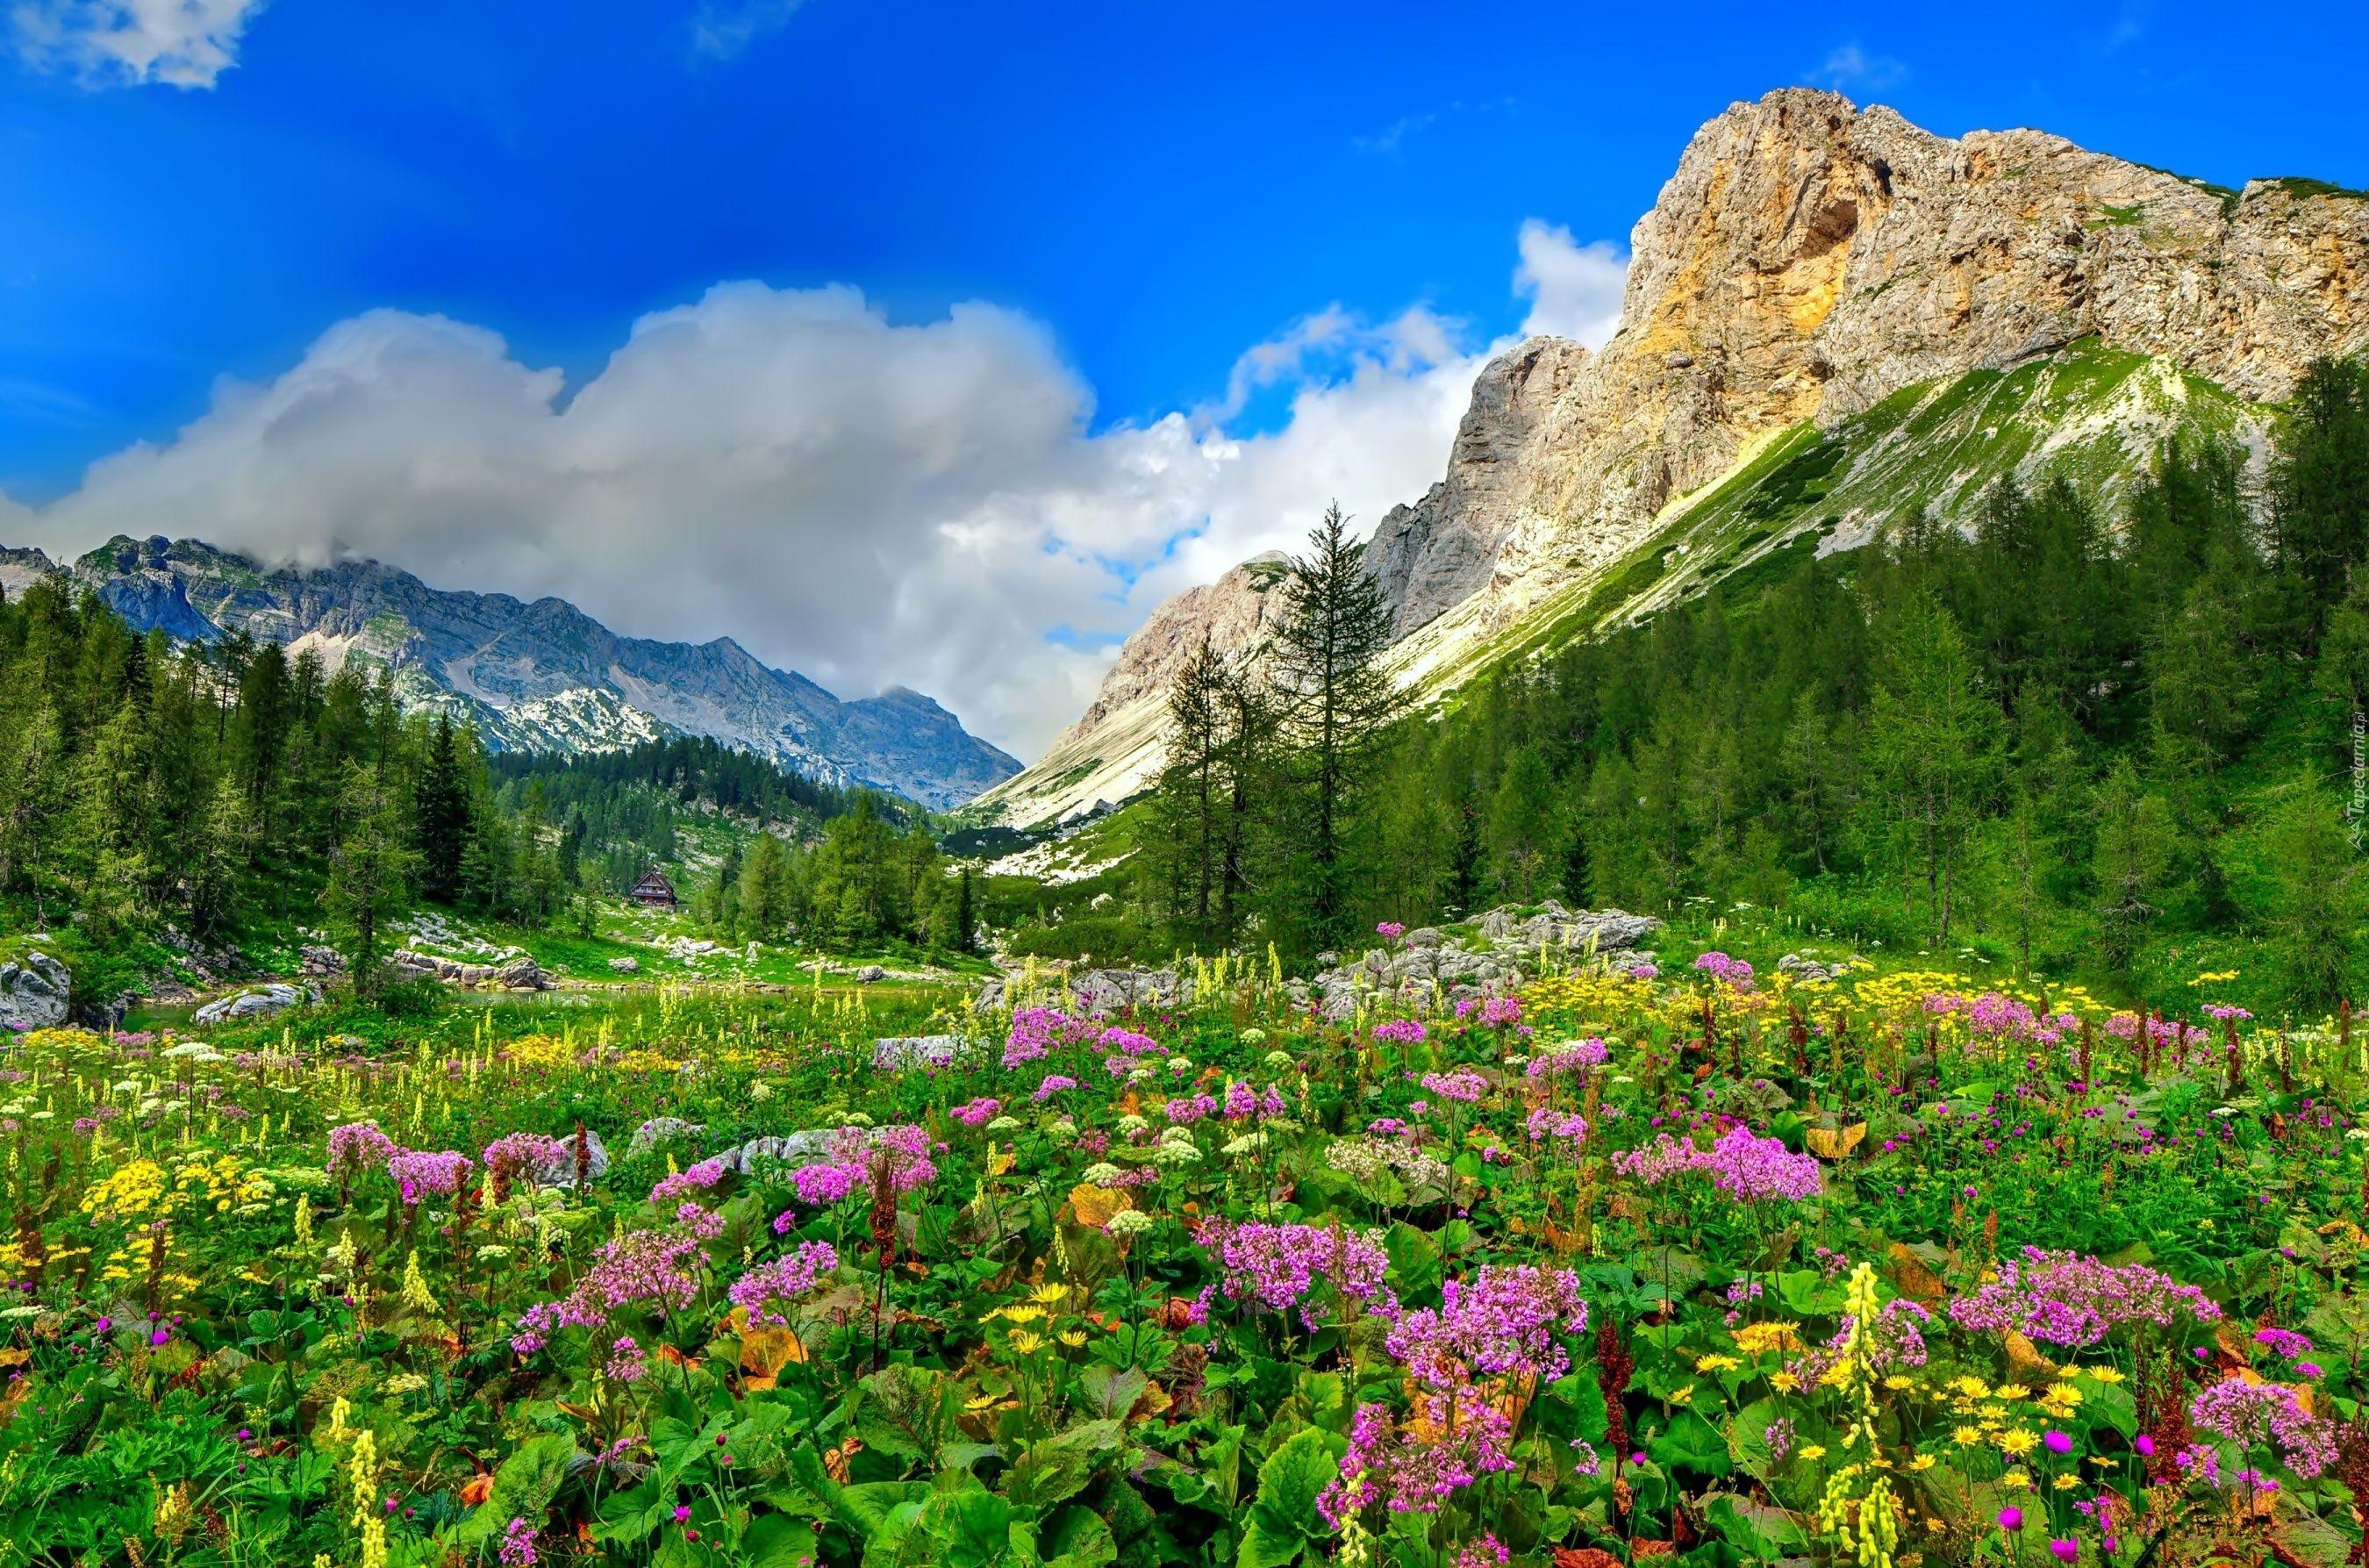 Wiosna Colorado Wildflowers Landscape Trees Colorado Image